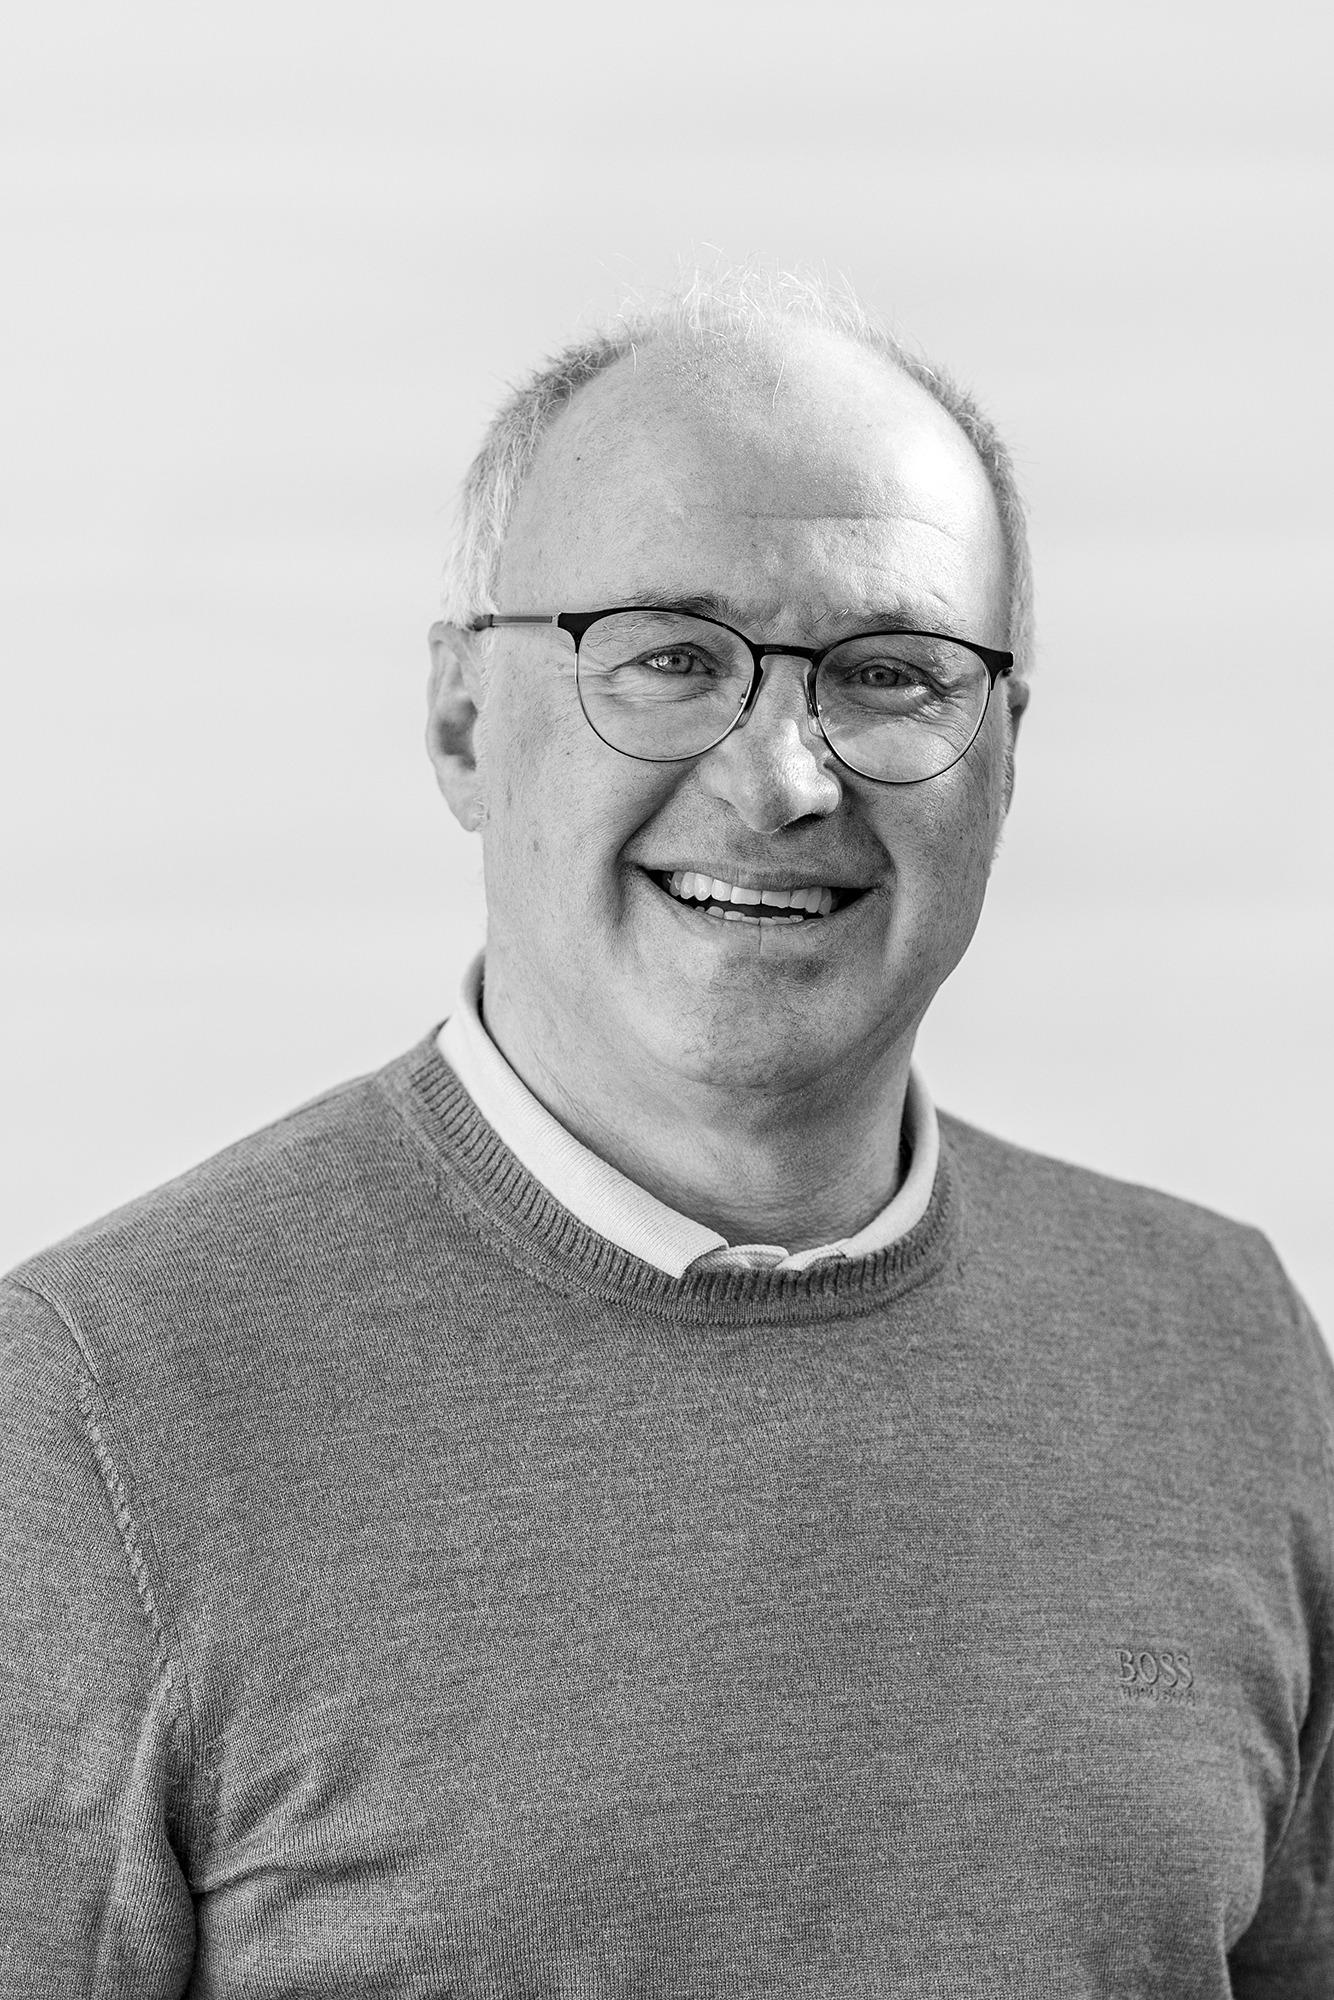 Gernot Neugebauer